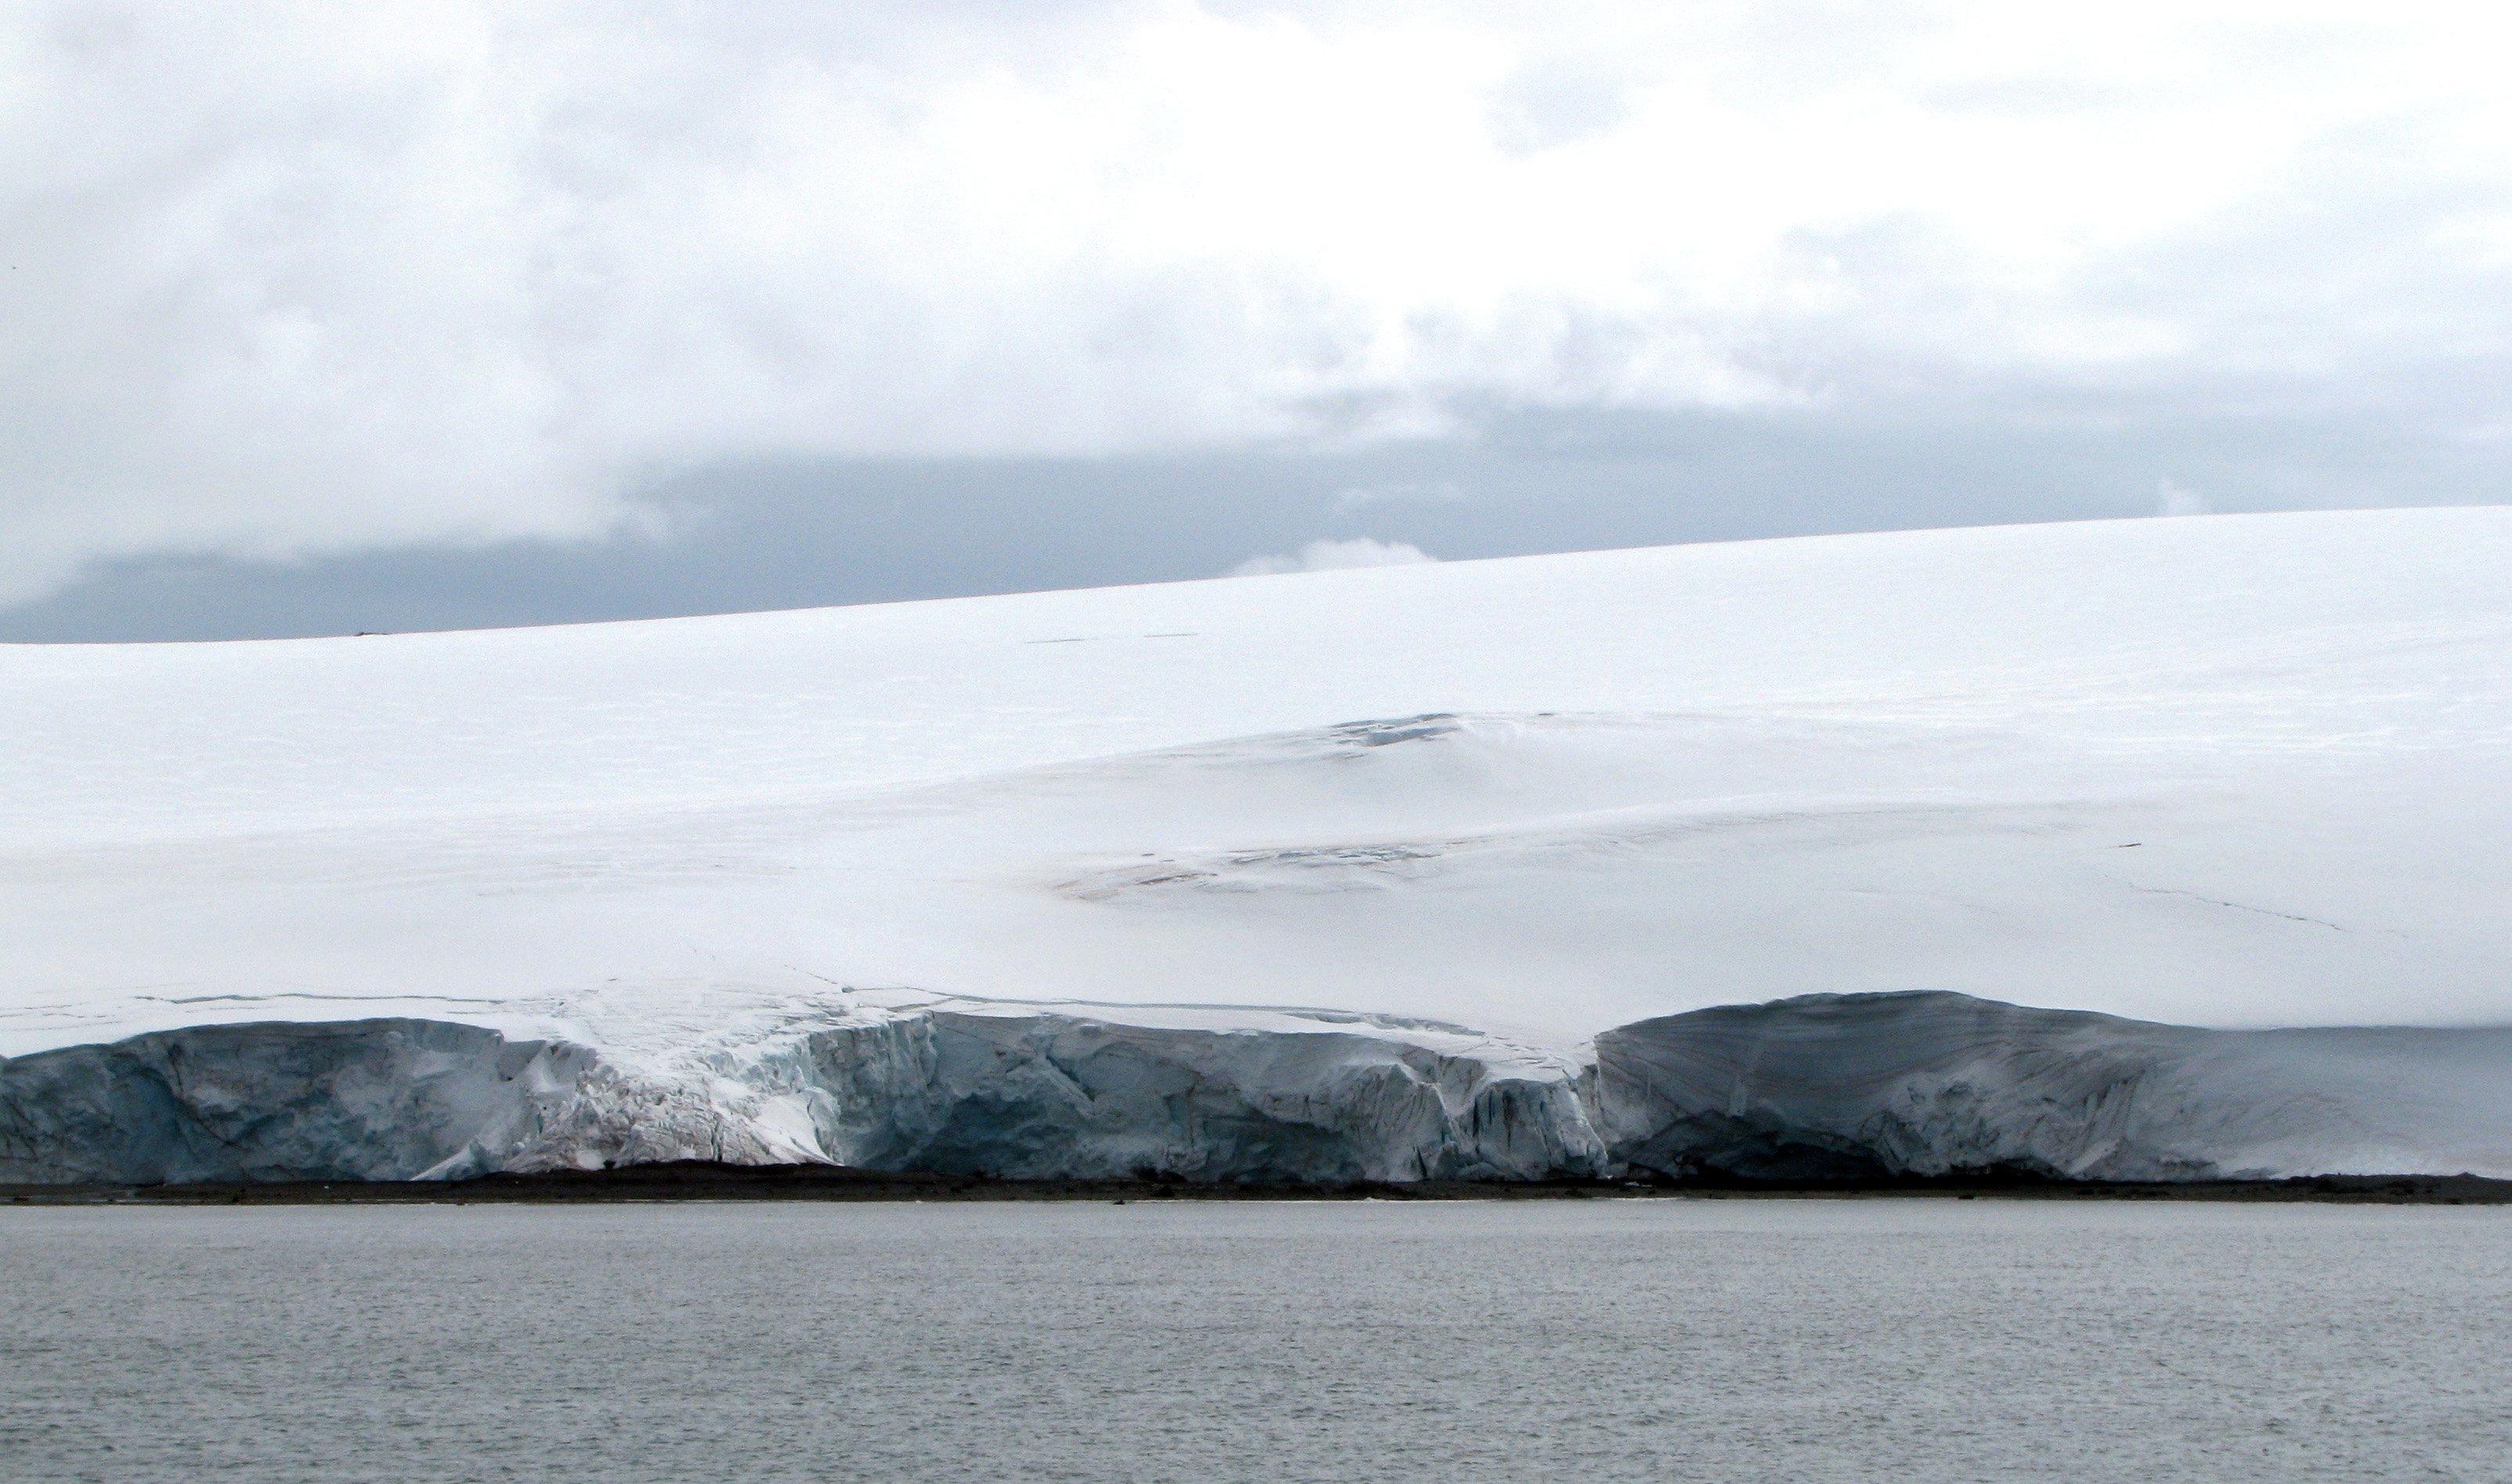 Sea ice around Antarctica hits record low, preliminary US data show